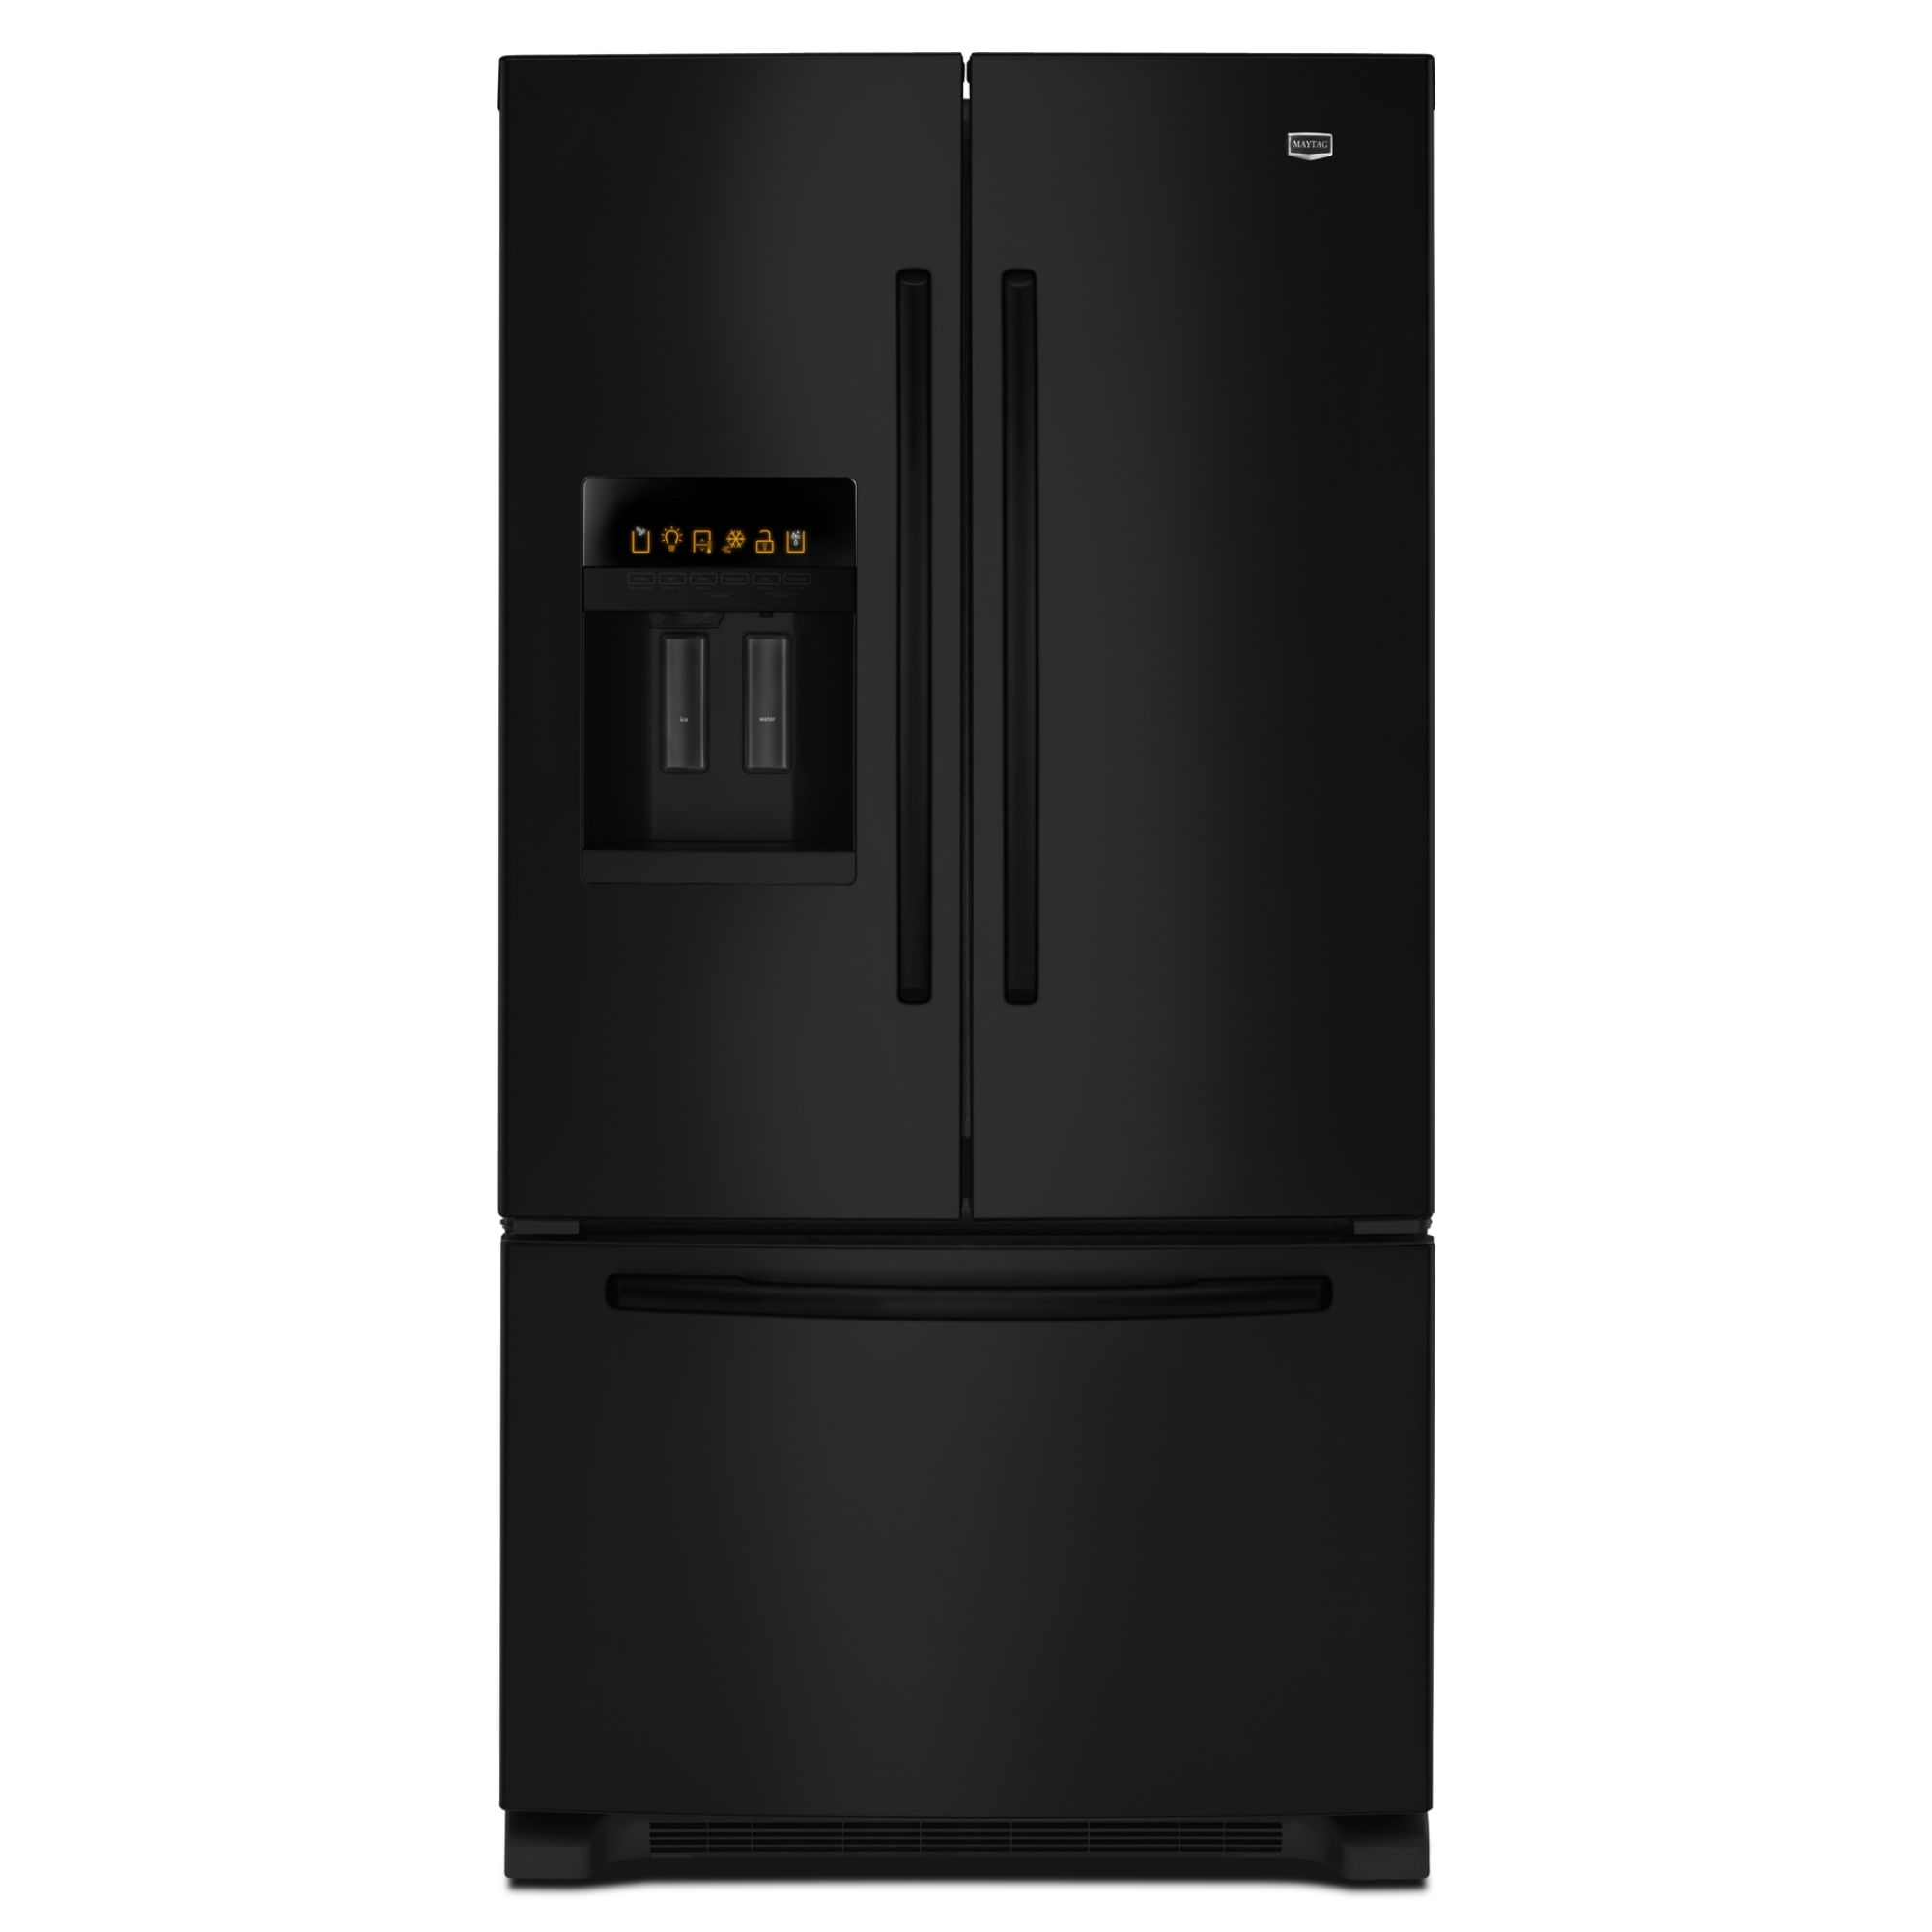 maytag french door refrigerator manual